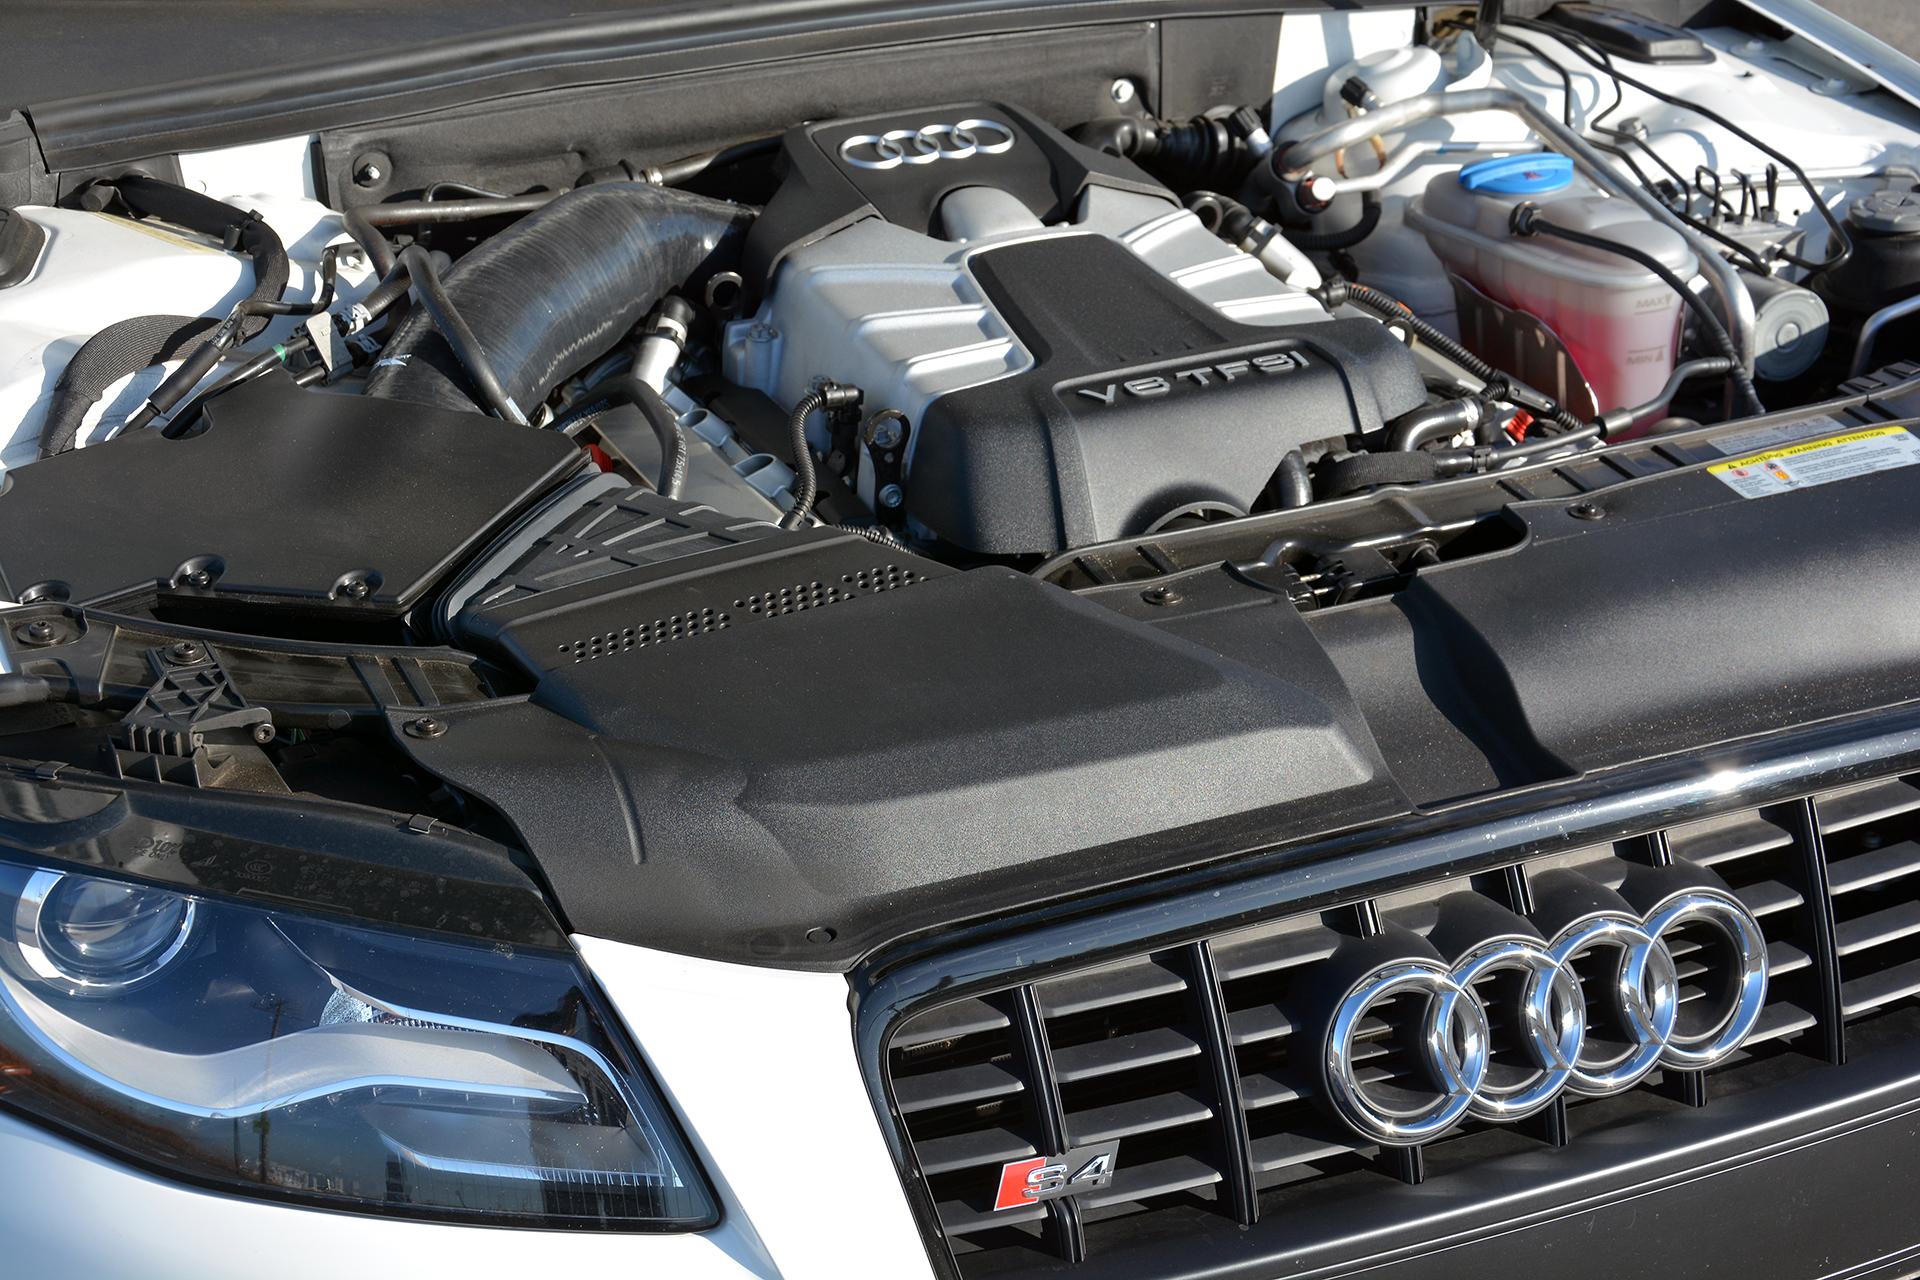 Audi a4 exhaust upgrades